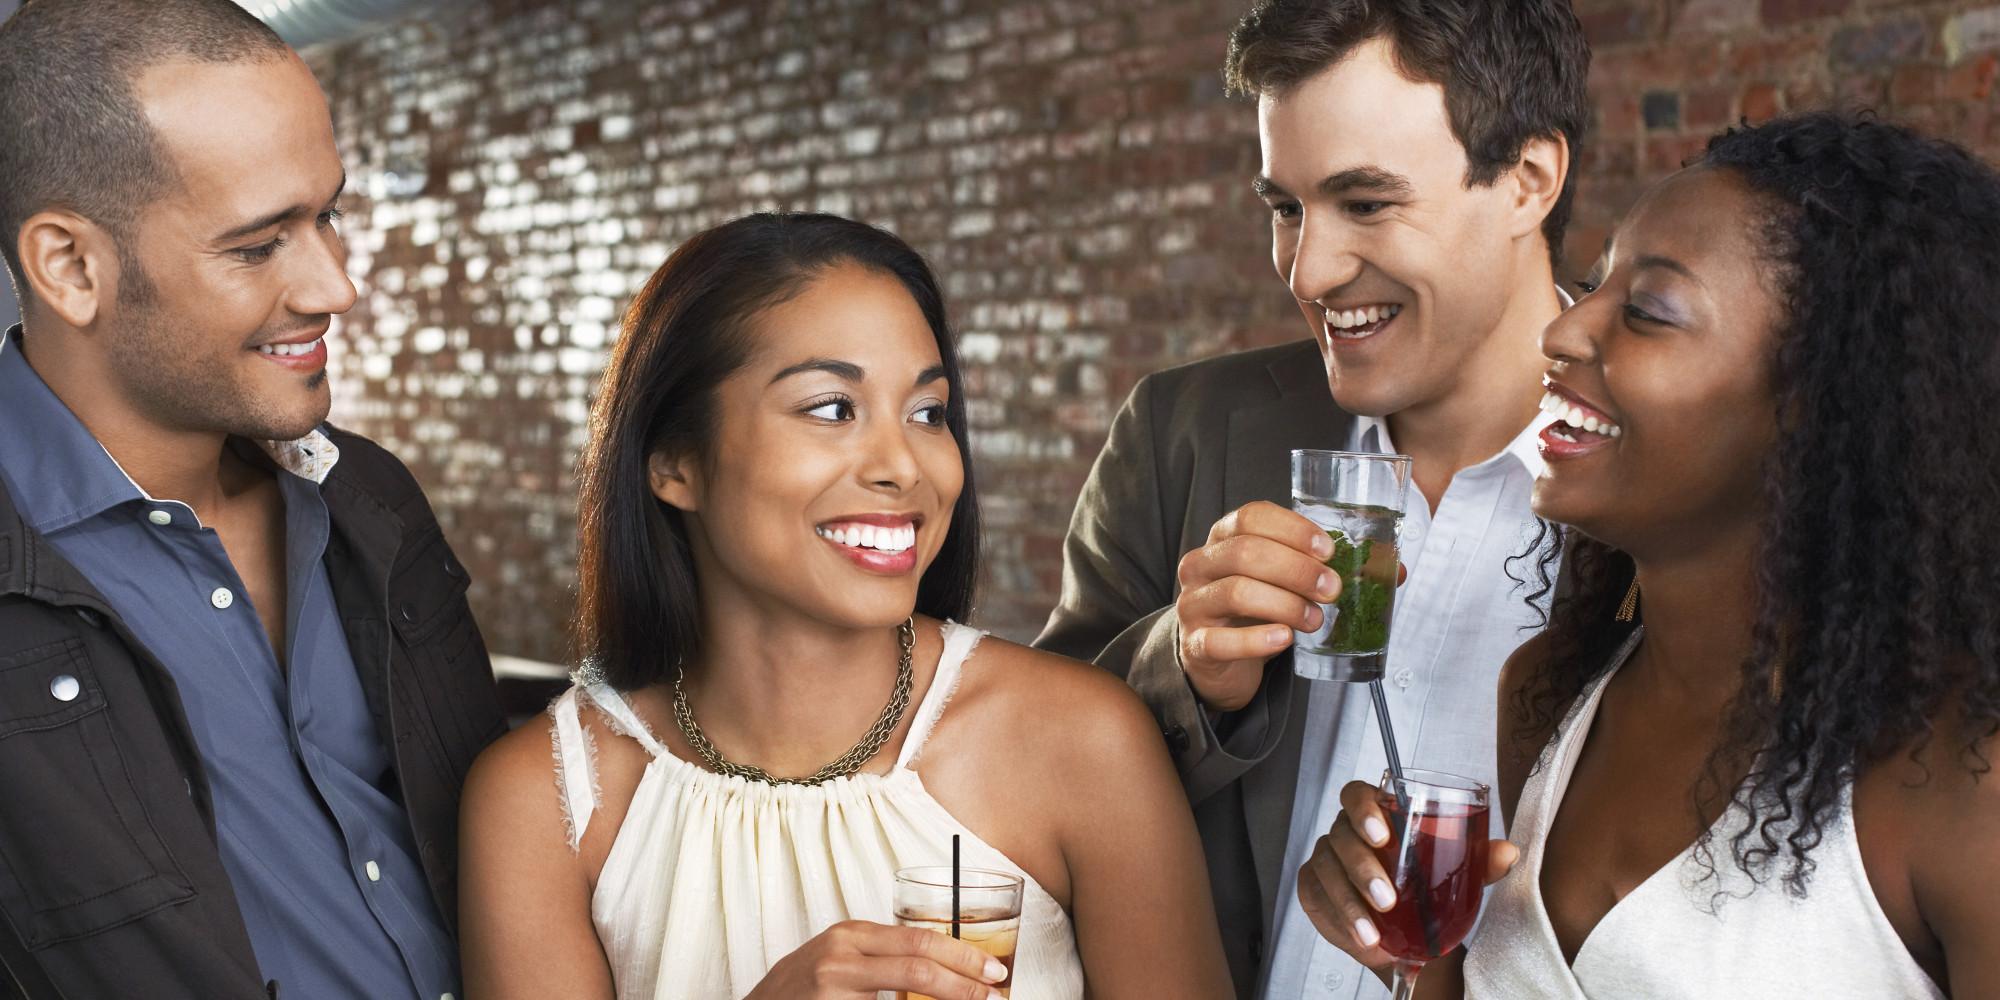 flirting moves that work on women day images 2017 women